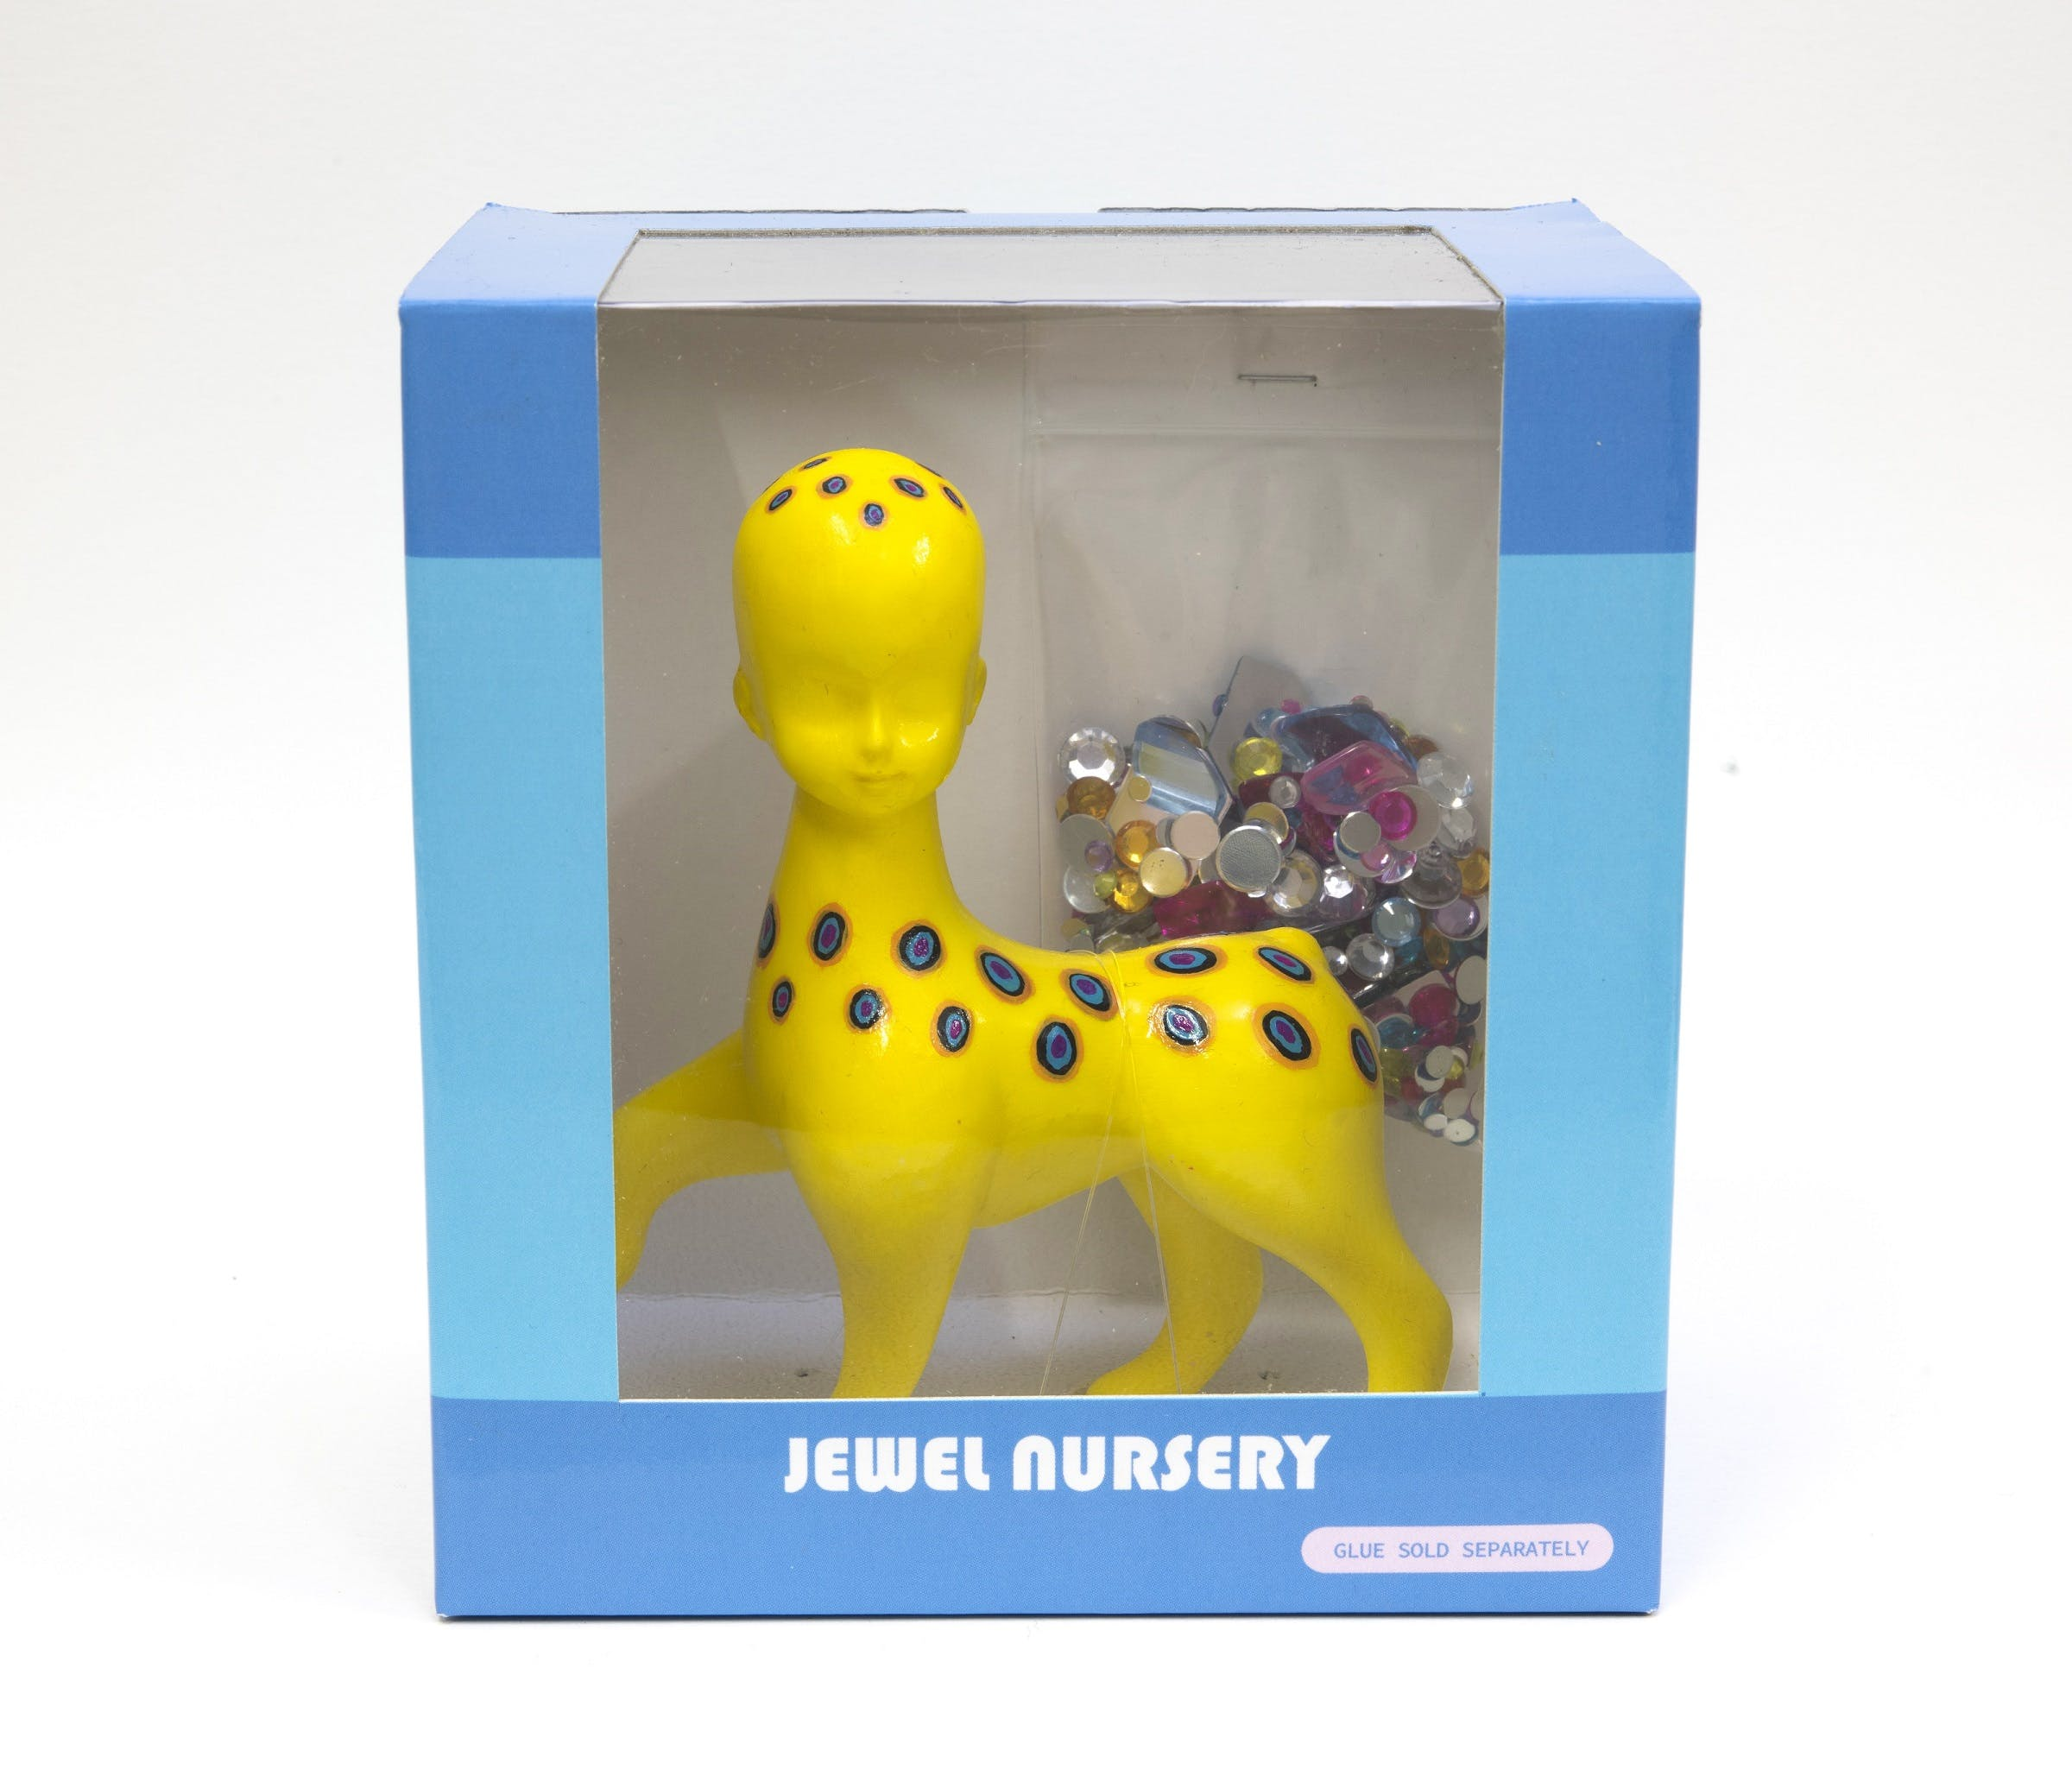 Jewel nursery/yellow